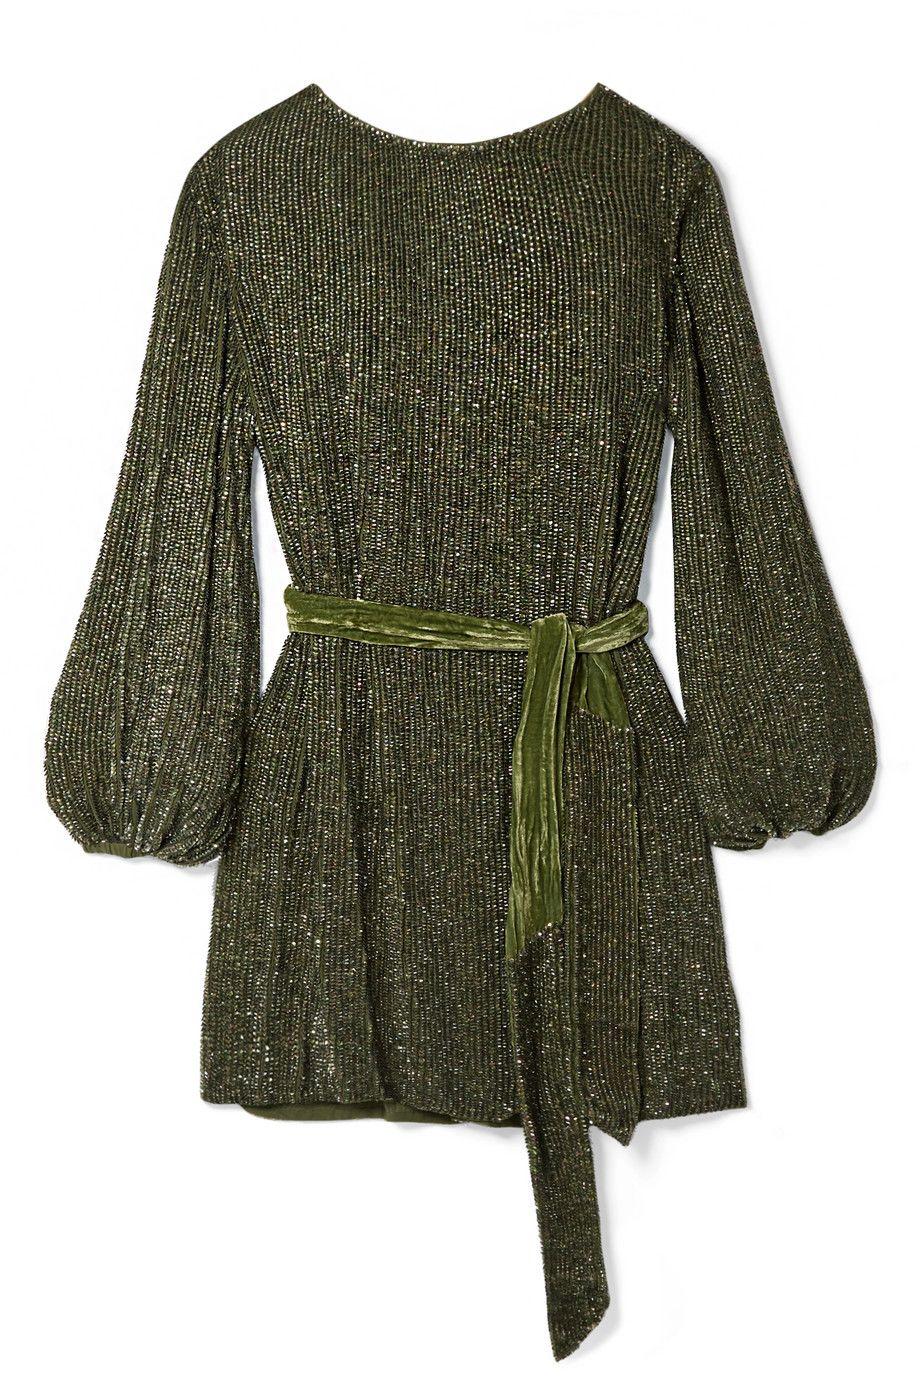 GREEN SEQUIN MINI DRESS WITH BELT